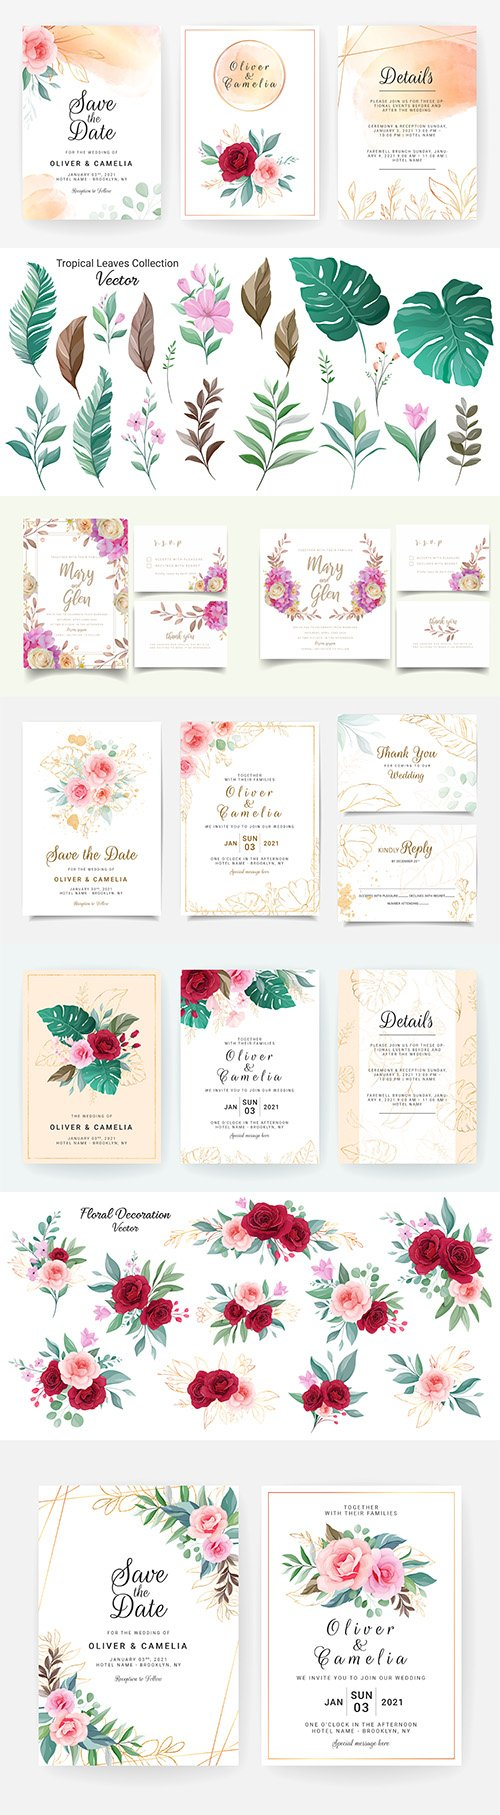 Wedding floral watercolor decorative invitations 22